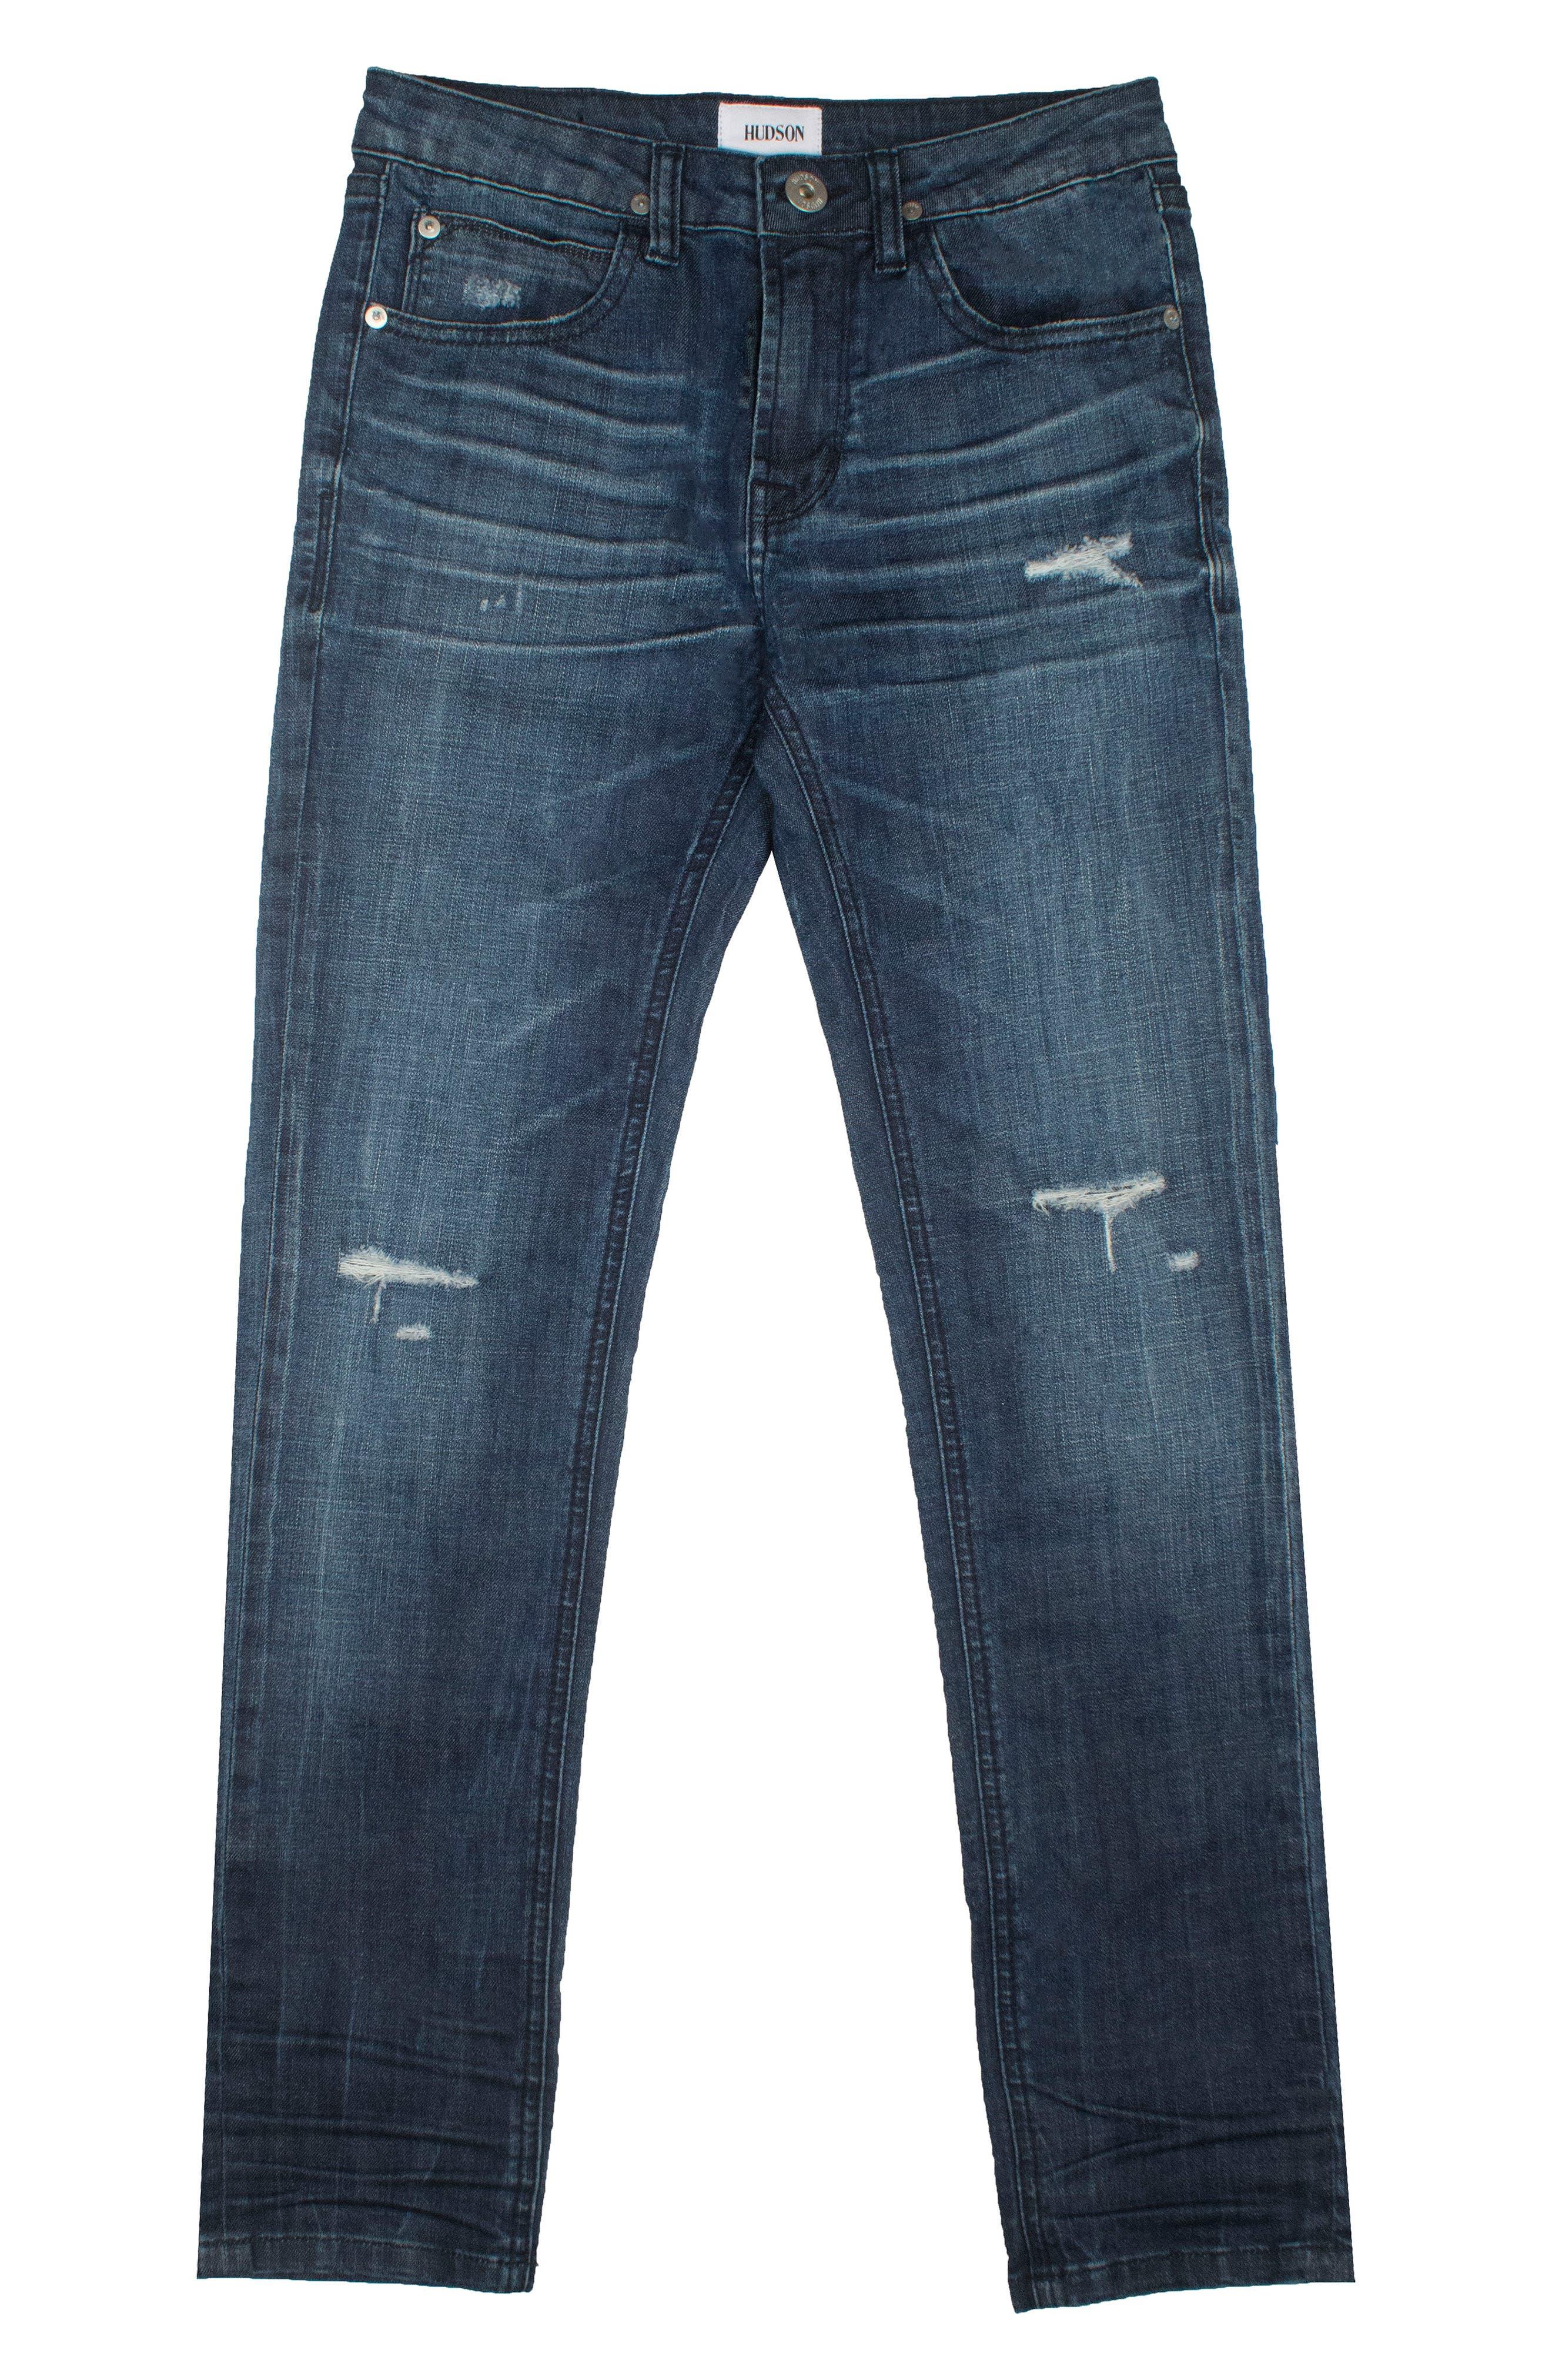 Hudson Kids Jude Skinny Jeans (Storm) (Baby Boys)